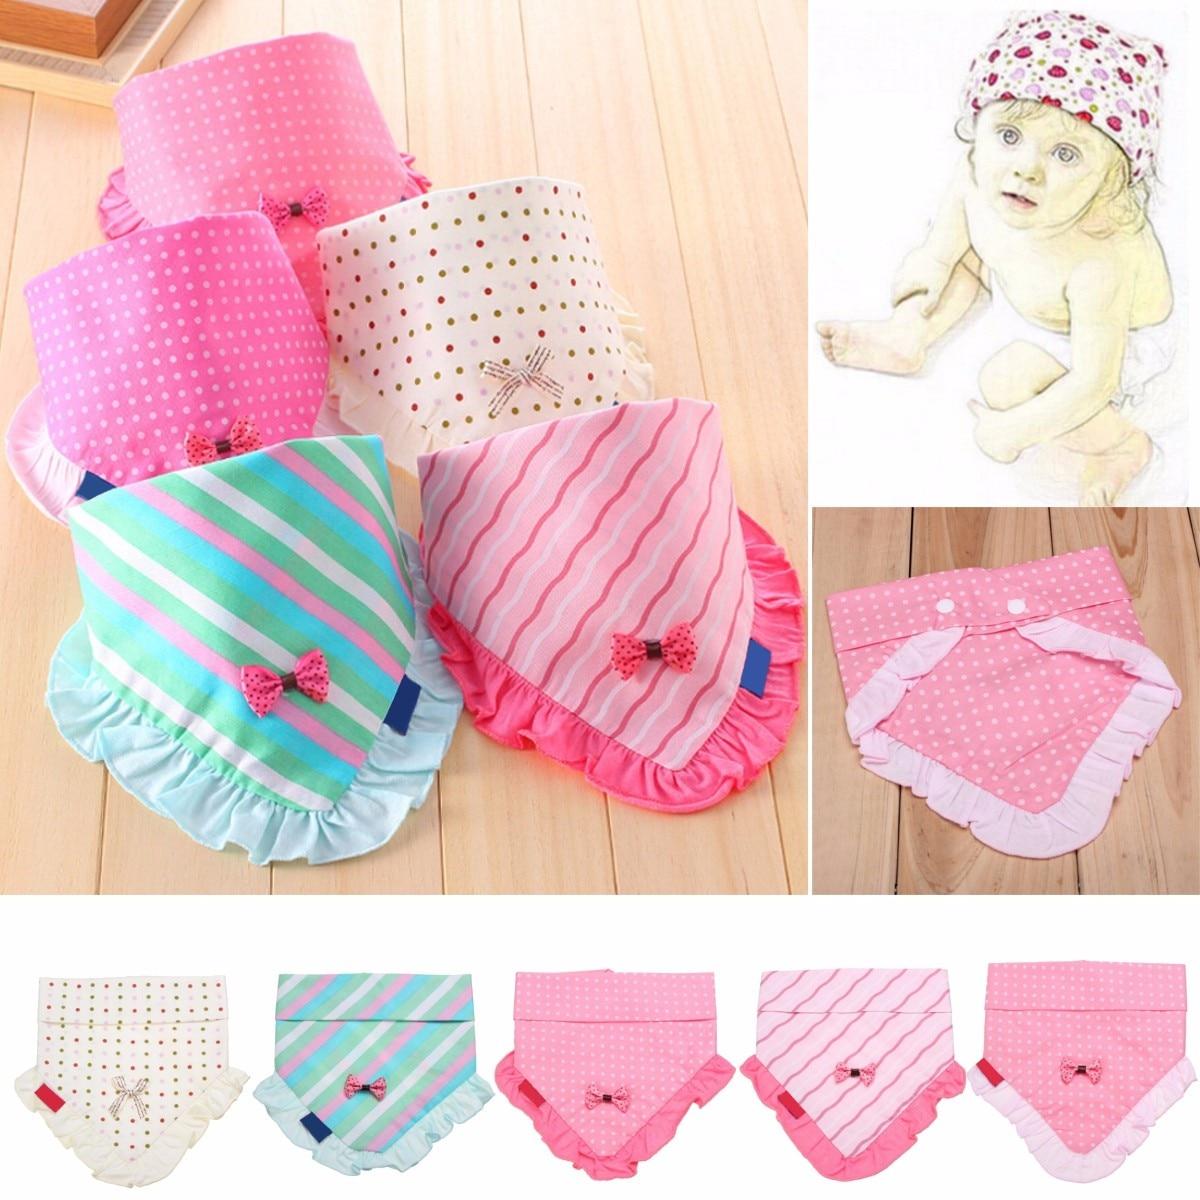 Toddler Baby Scarf Triangle Saliva Towel Bibs Bandana Cotton Feeding Scarf G